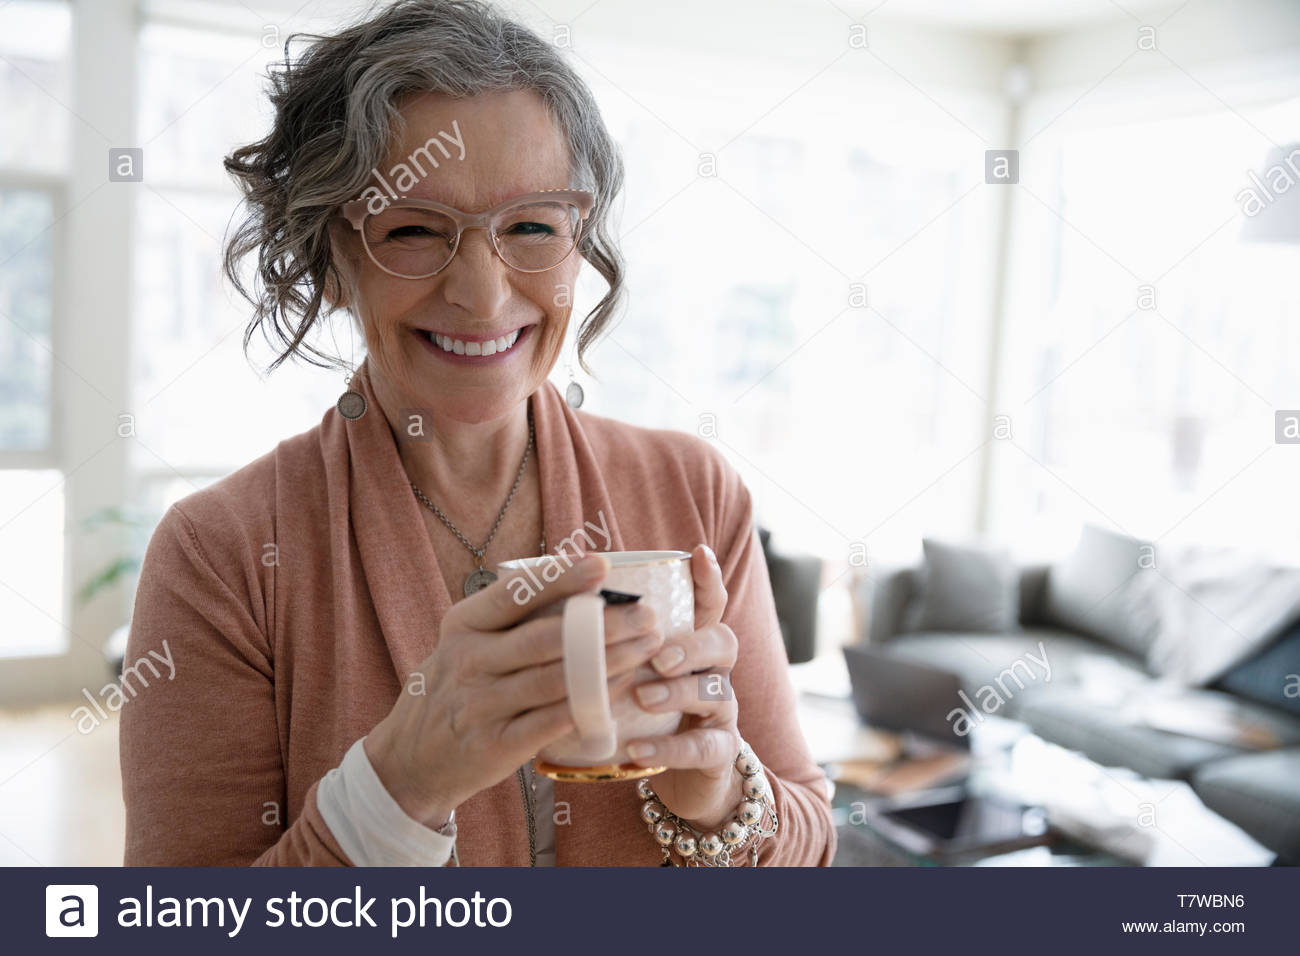 Portrait of happy woman drinking coffee Photo Stock